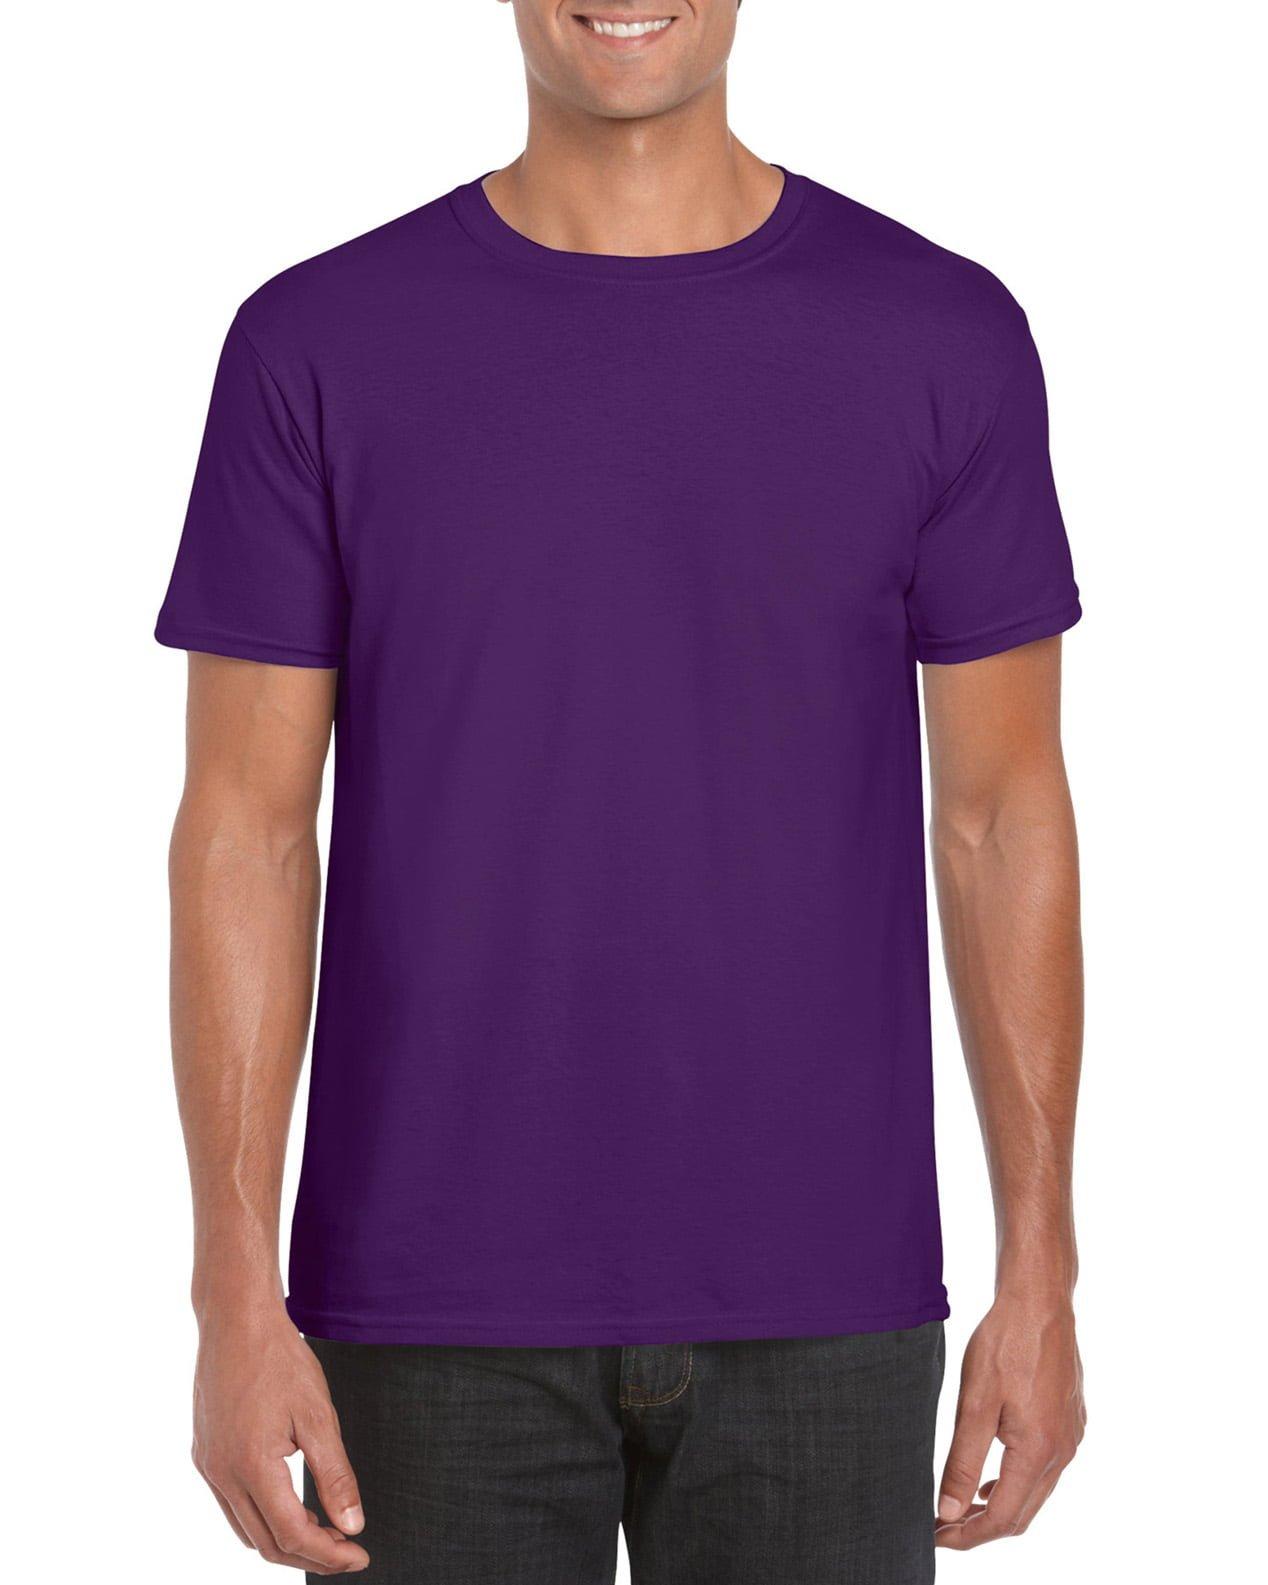 Softstyle Unisex Tee-Purple